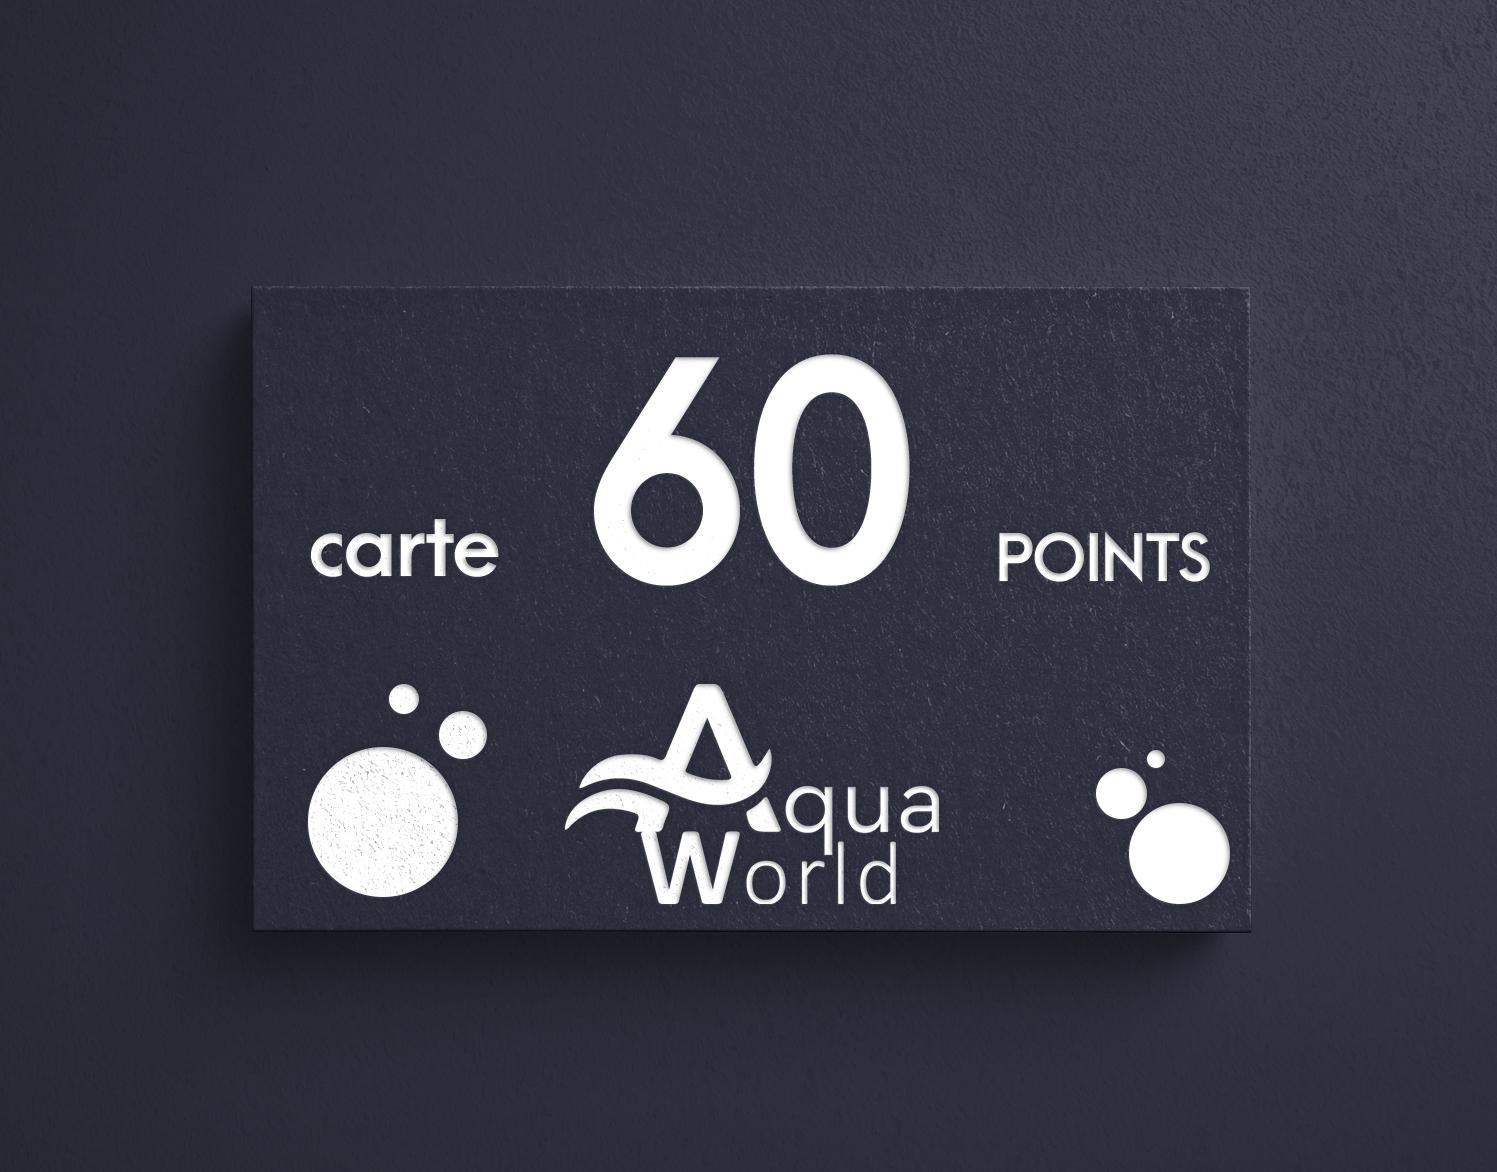 carte 60 points aquaworld